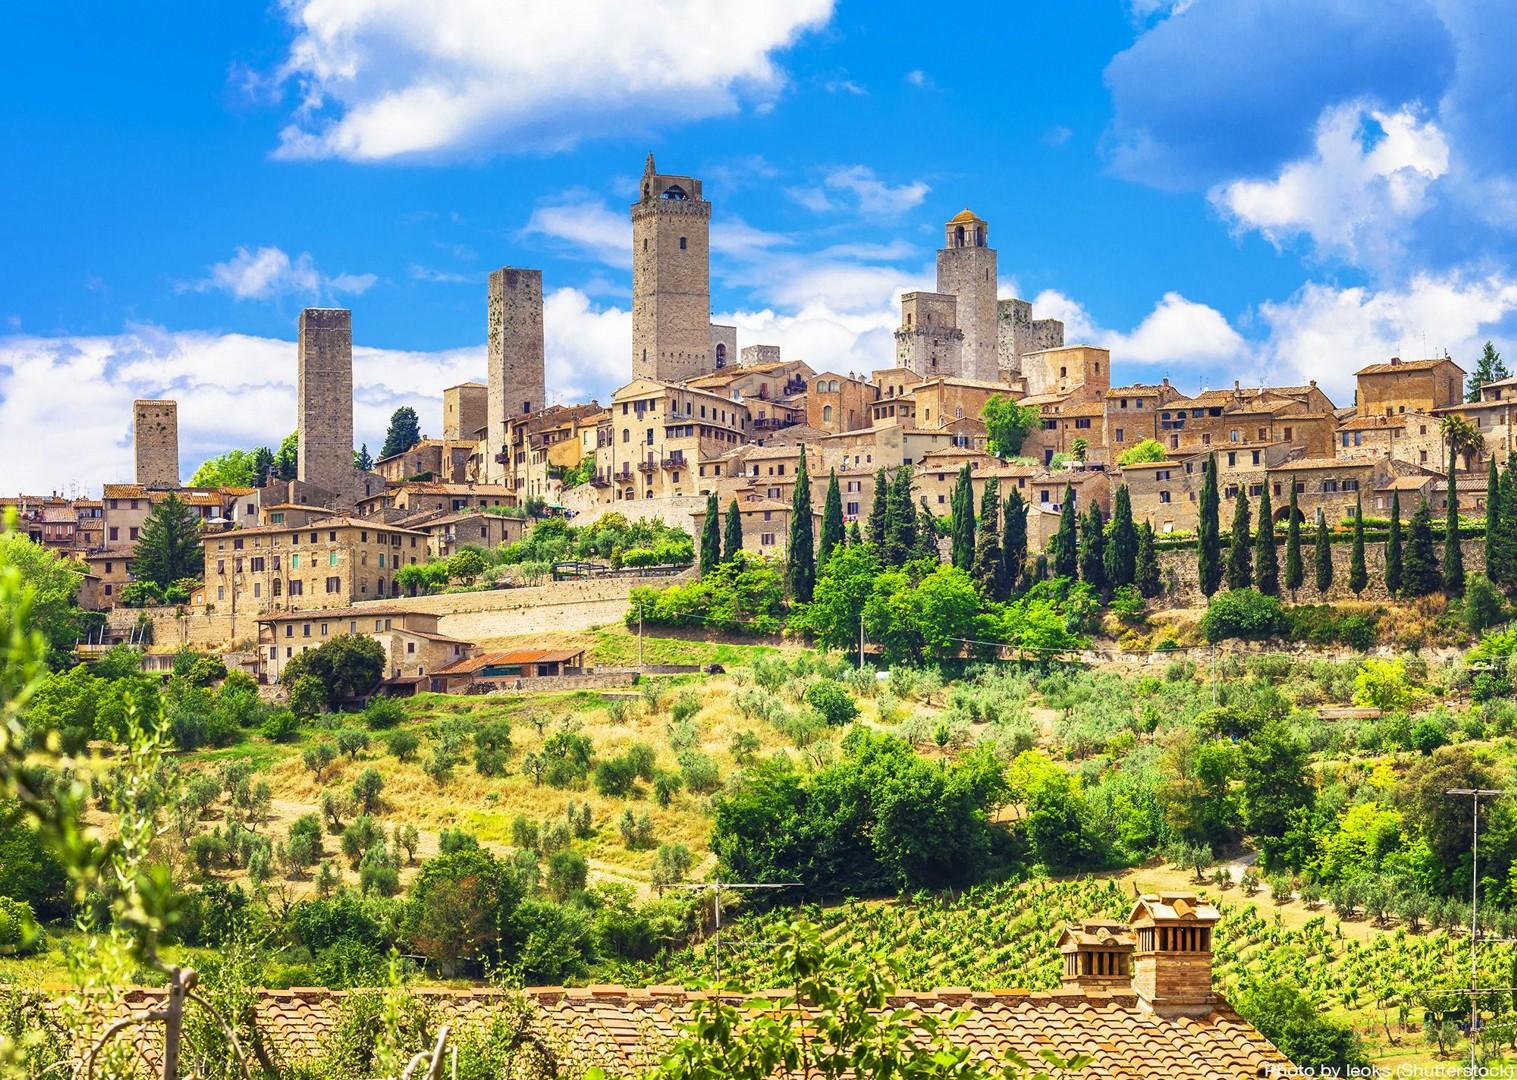 san-giminiano-italy-tuscany-leisure-cycling-culture.jpg - Italy - Tuscany - Giro della Toscana - Self-Guided Road Cycling Holiday - Road Cycling